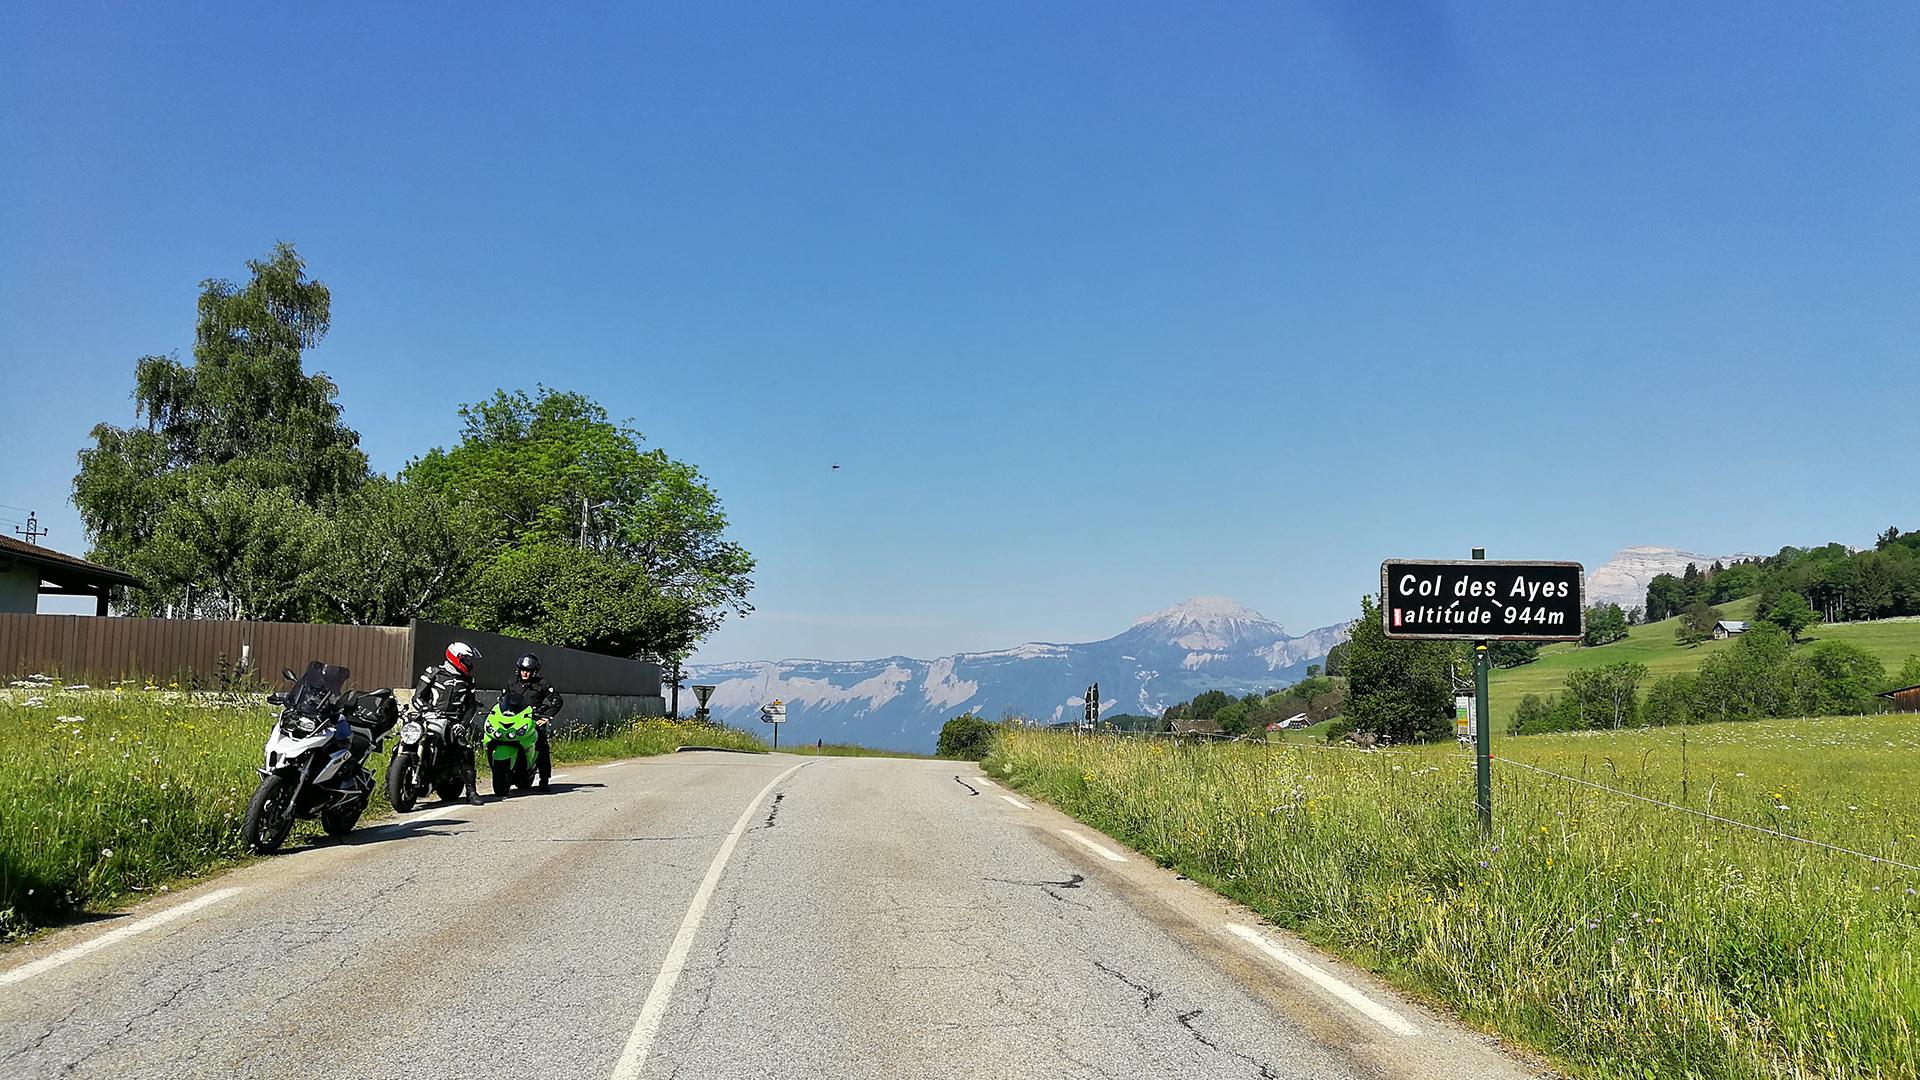 0944 - F - Col des Ayes